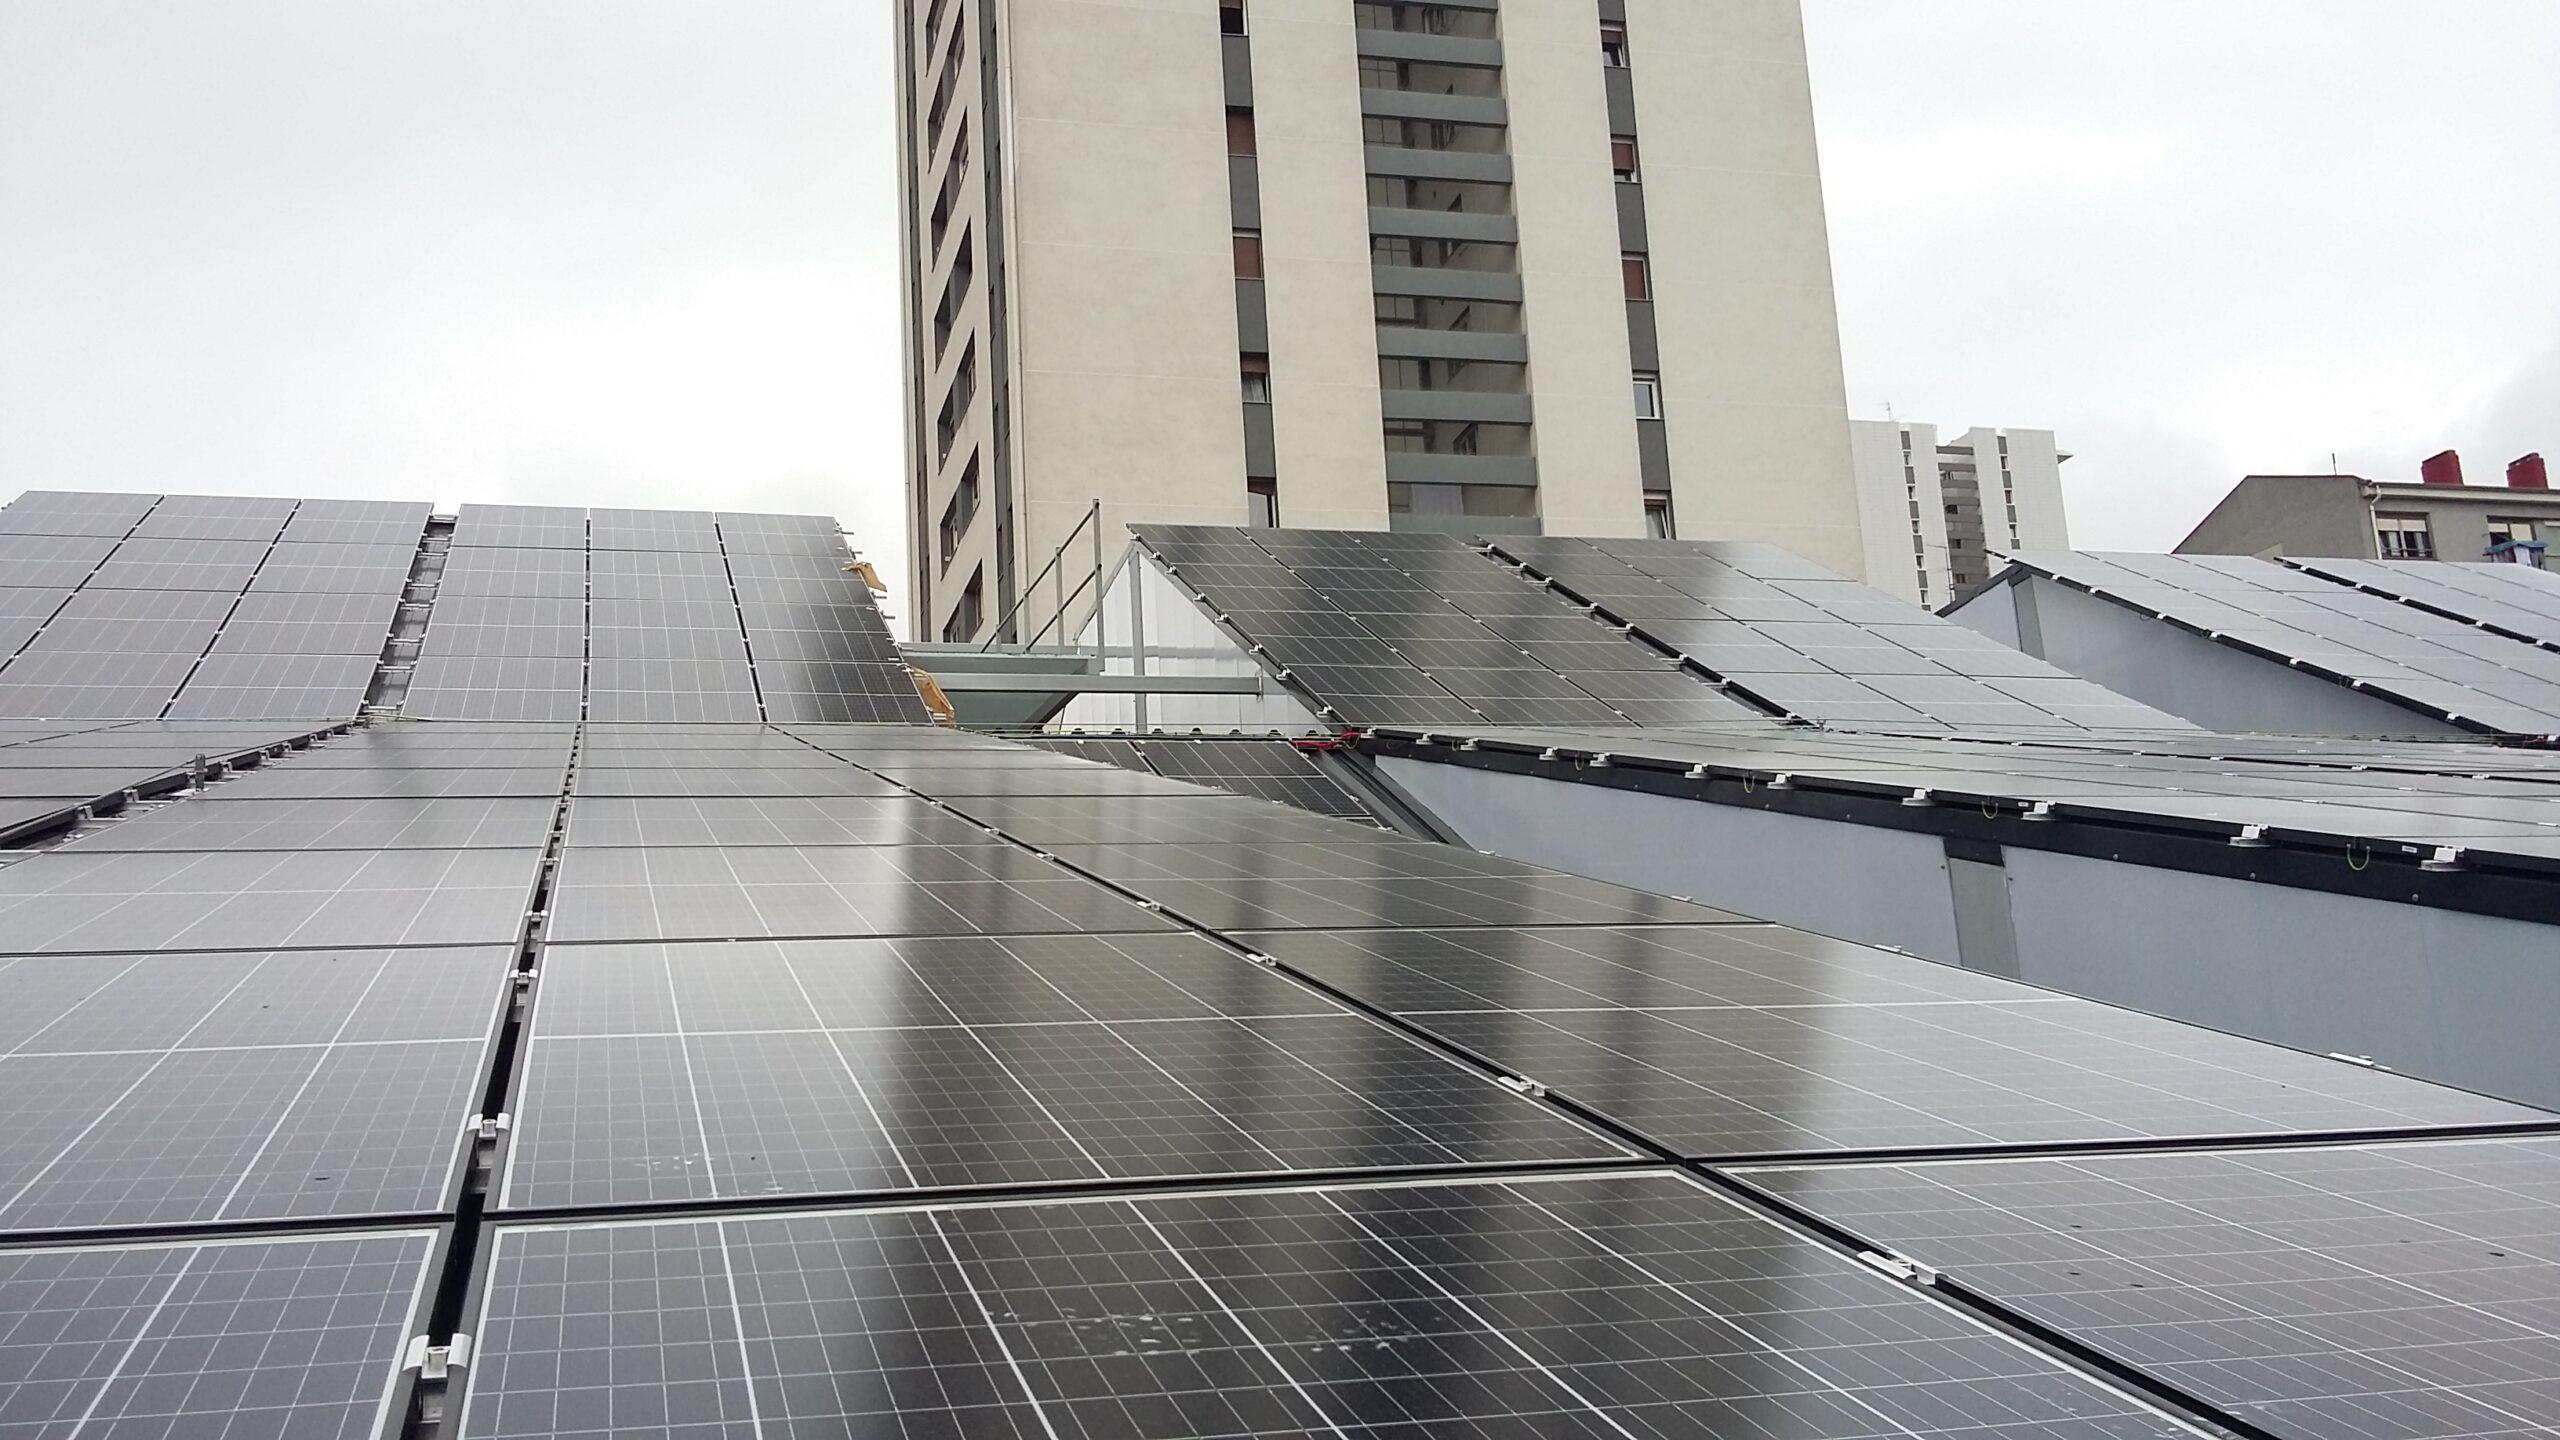 instalación fotovoltaica autoconsumo bizkaia